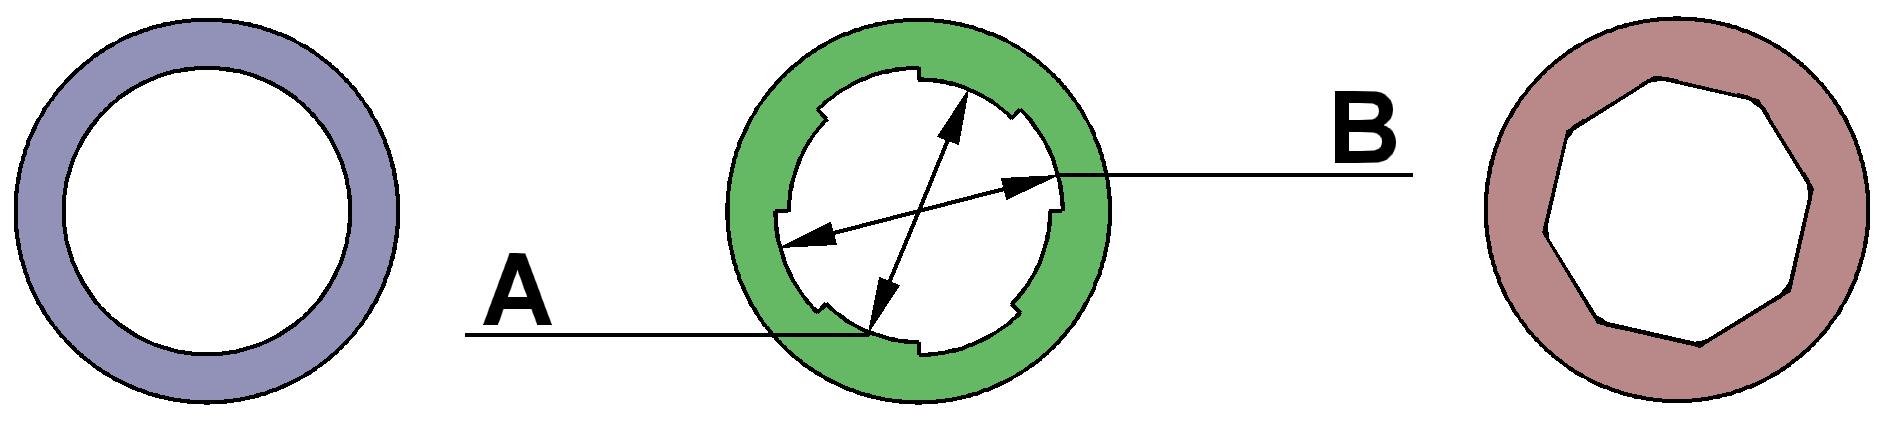 http://upload.wikimedia.org/wikipedia/commons/1/12/Gun_barrels_cross_sectional_drawing.png?uselang=ru